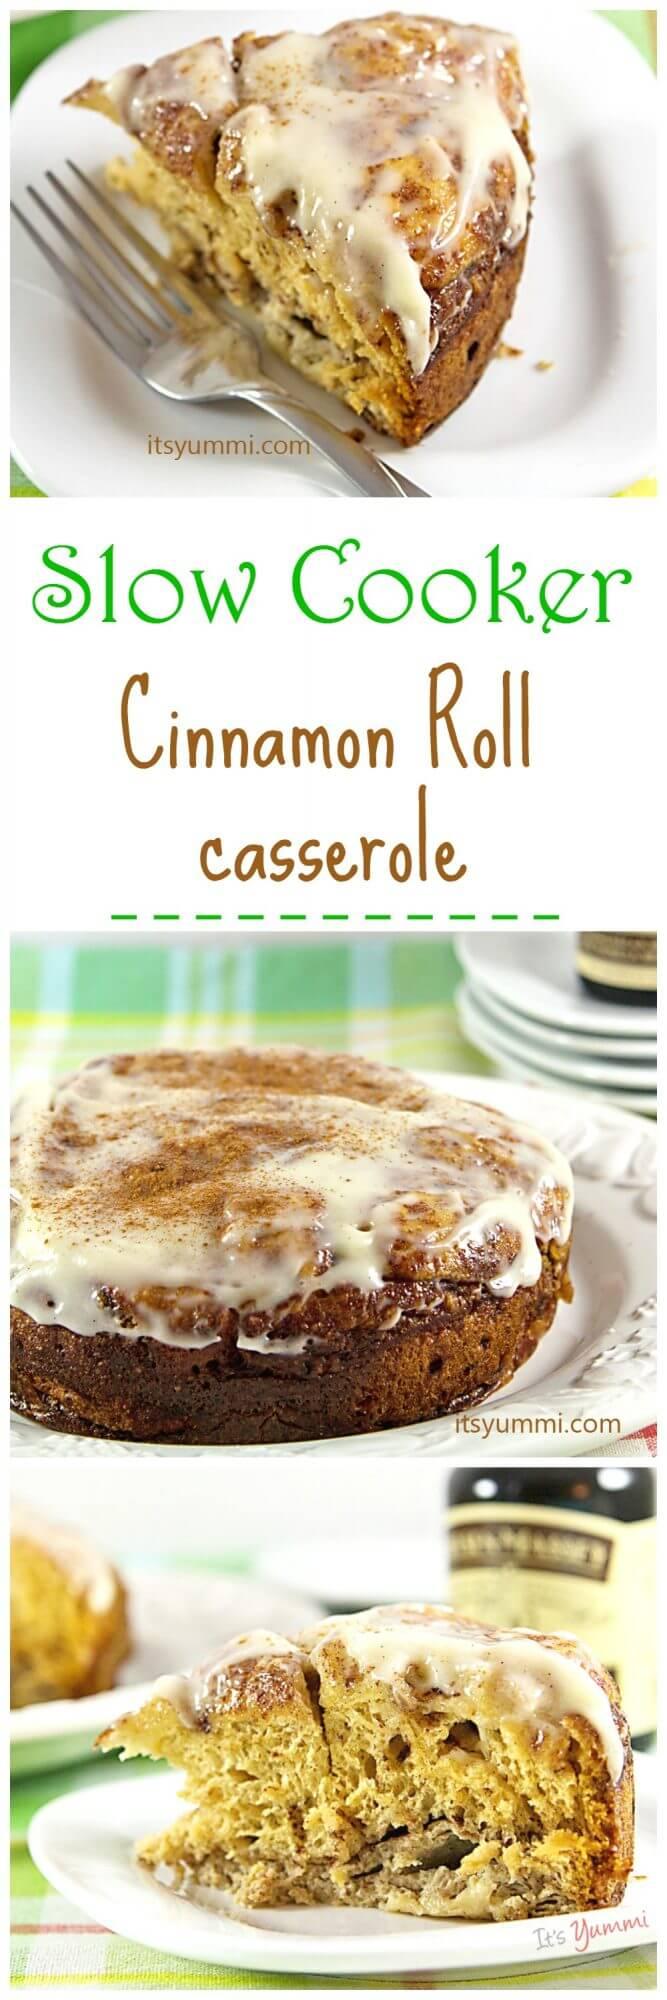 Easy Slow Cooker Cinnamon Roll Casserole recipe, from @itsyummi